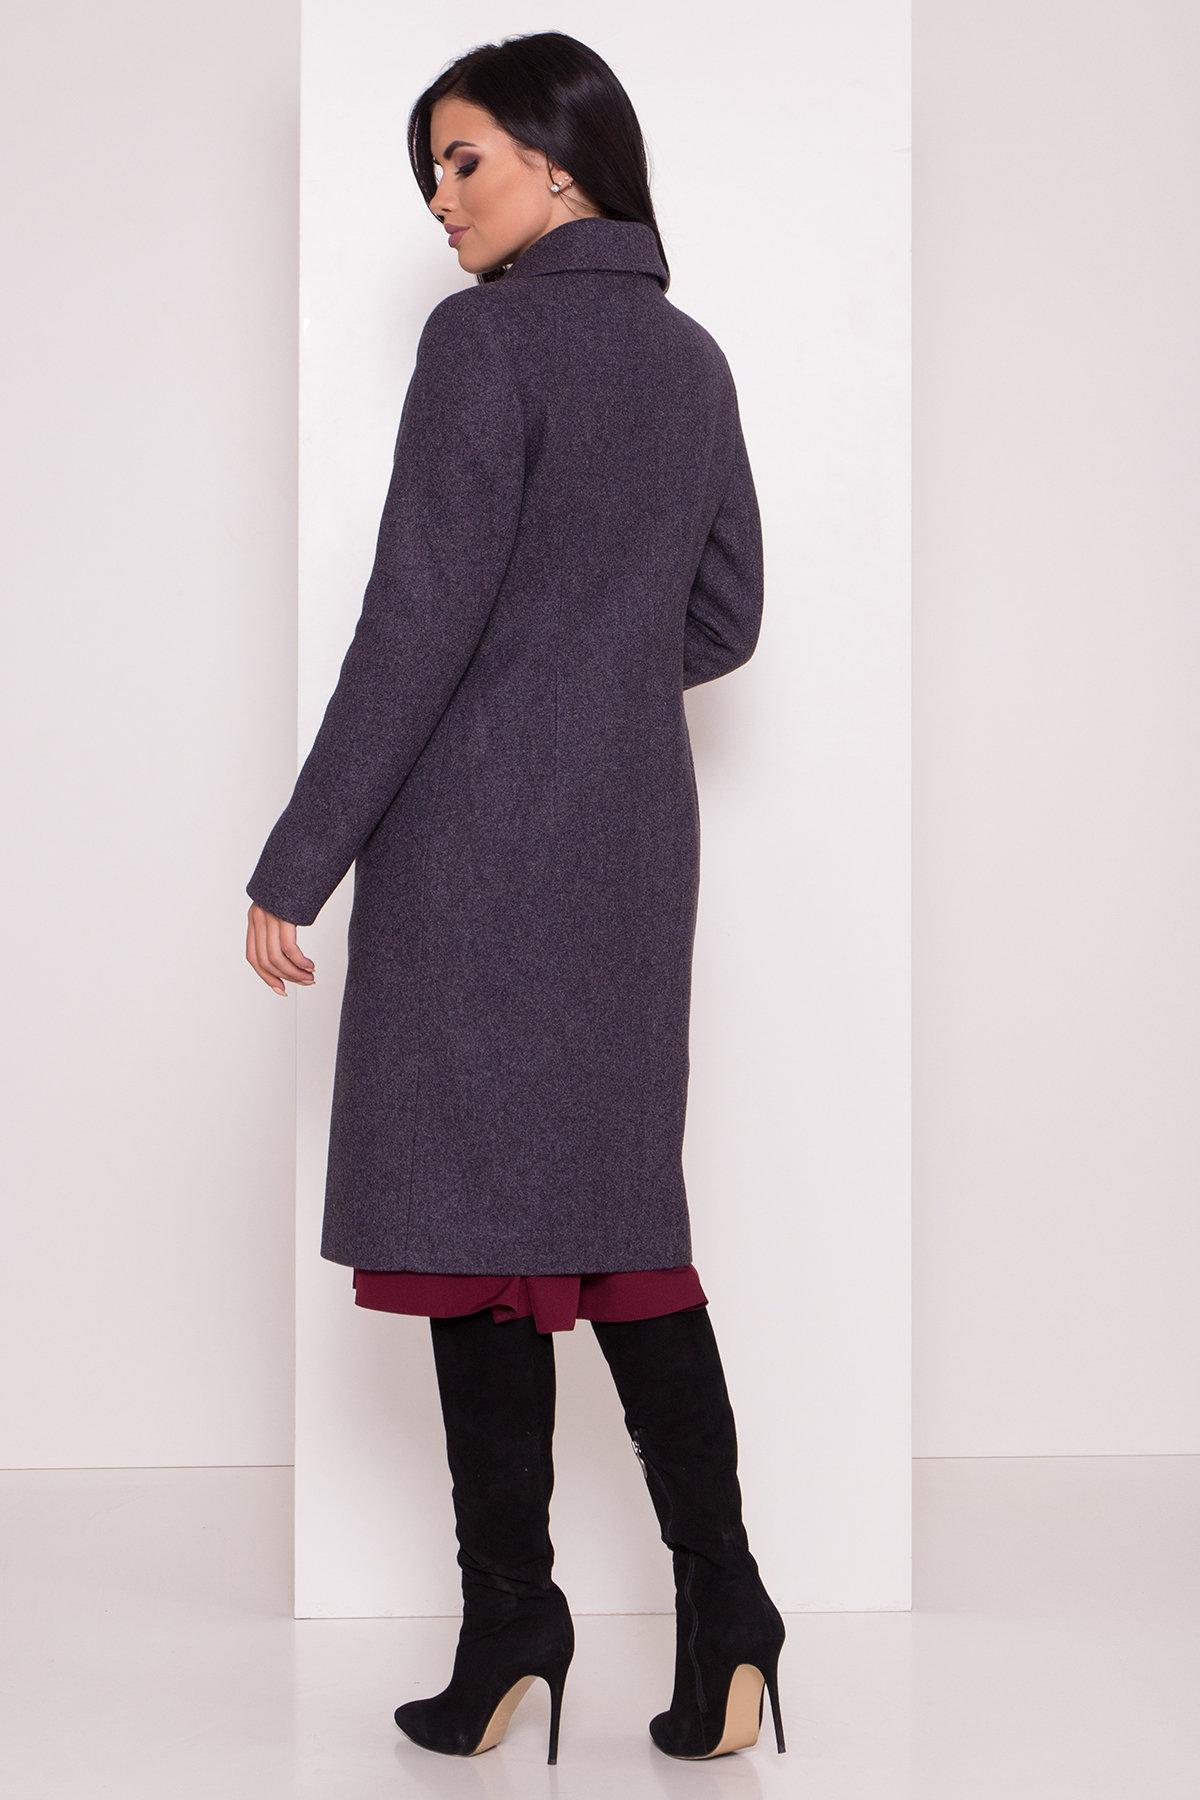 Пальто зима Кареро 8067 АРТ. 44013 Цвет: Т.синий 543 - фото 7, интернет магазин tm-modus.ru